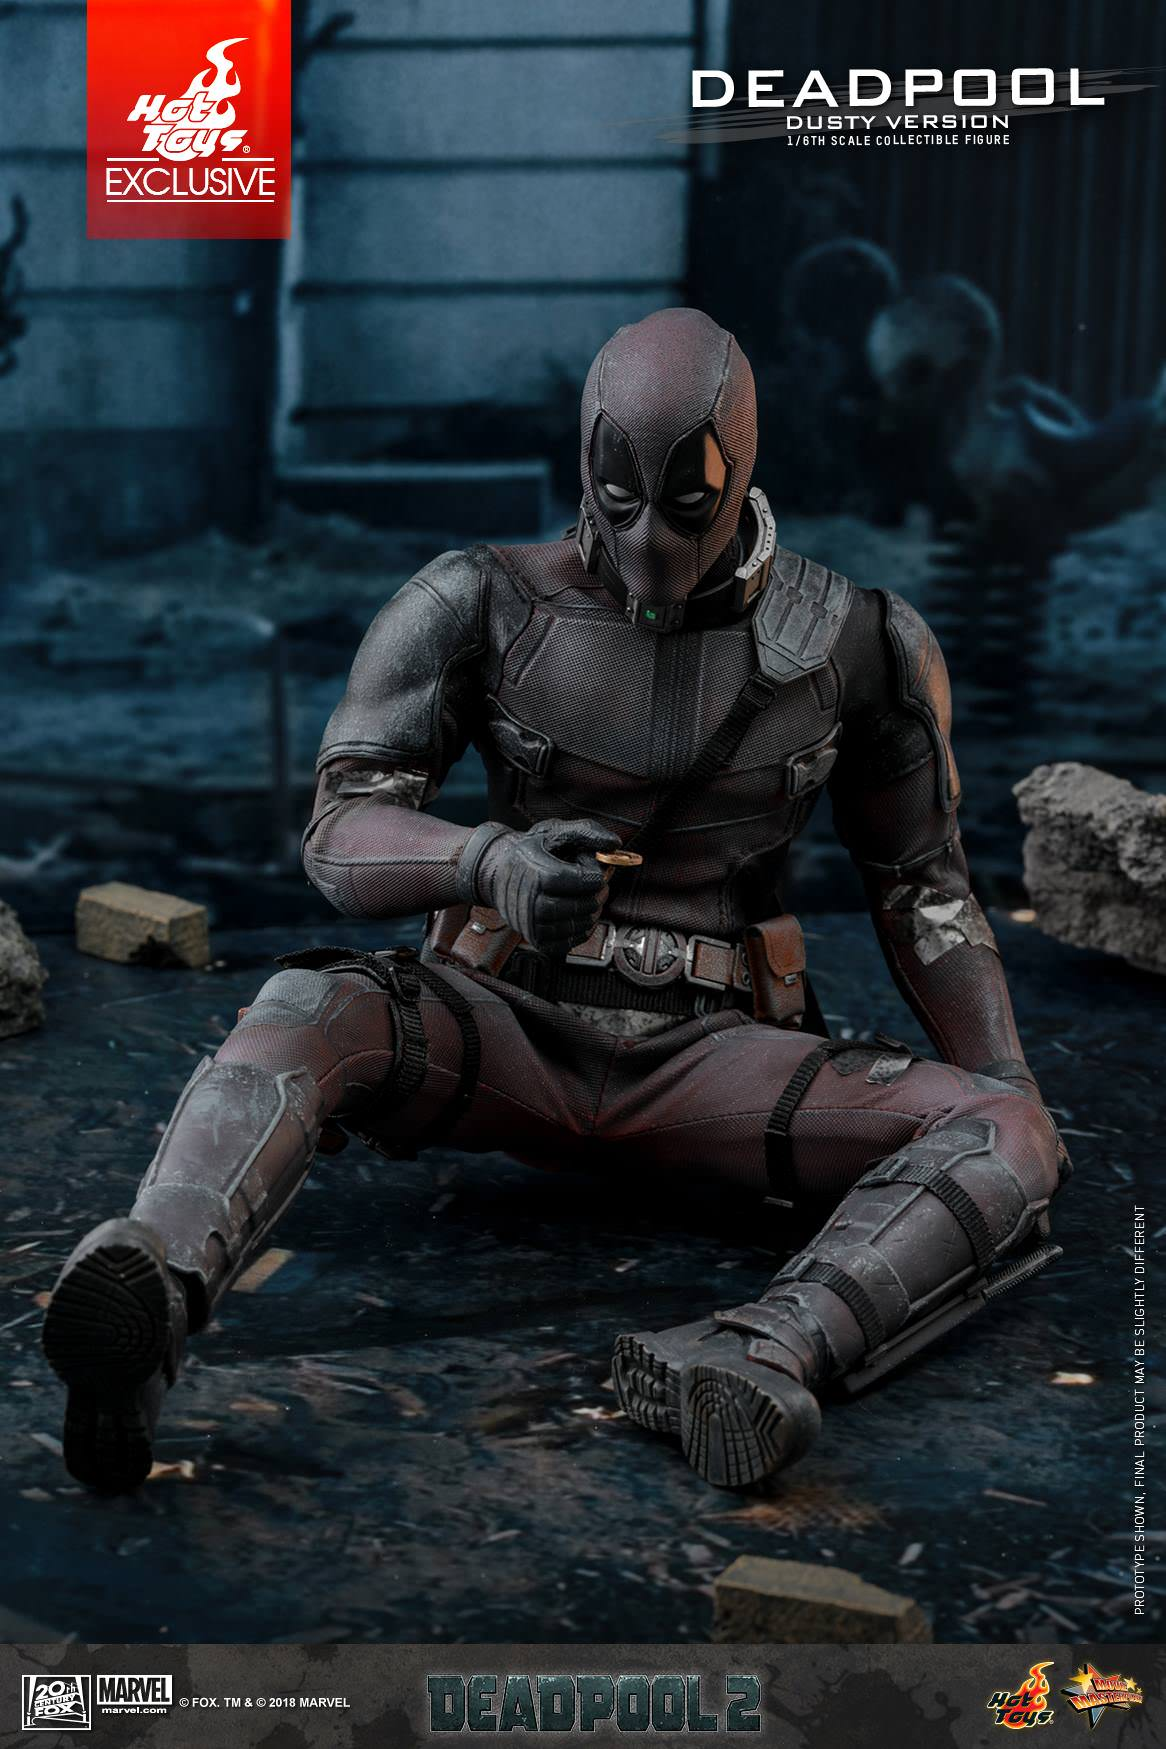 Hot Toys MMS 505 Deadpool 2 (Dusty Version) – Hot Toys